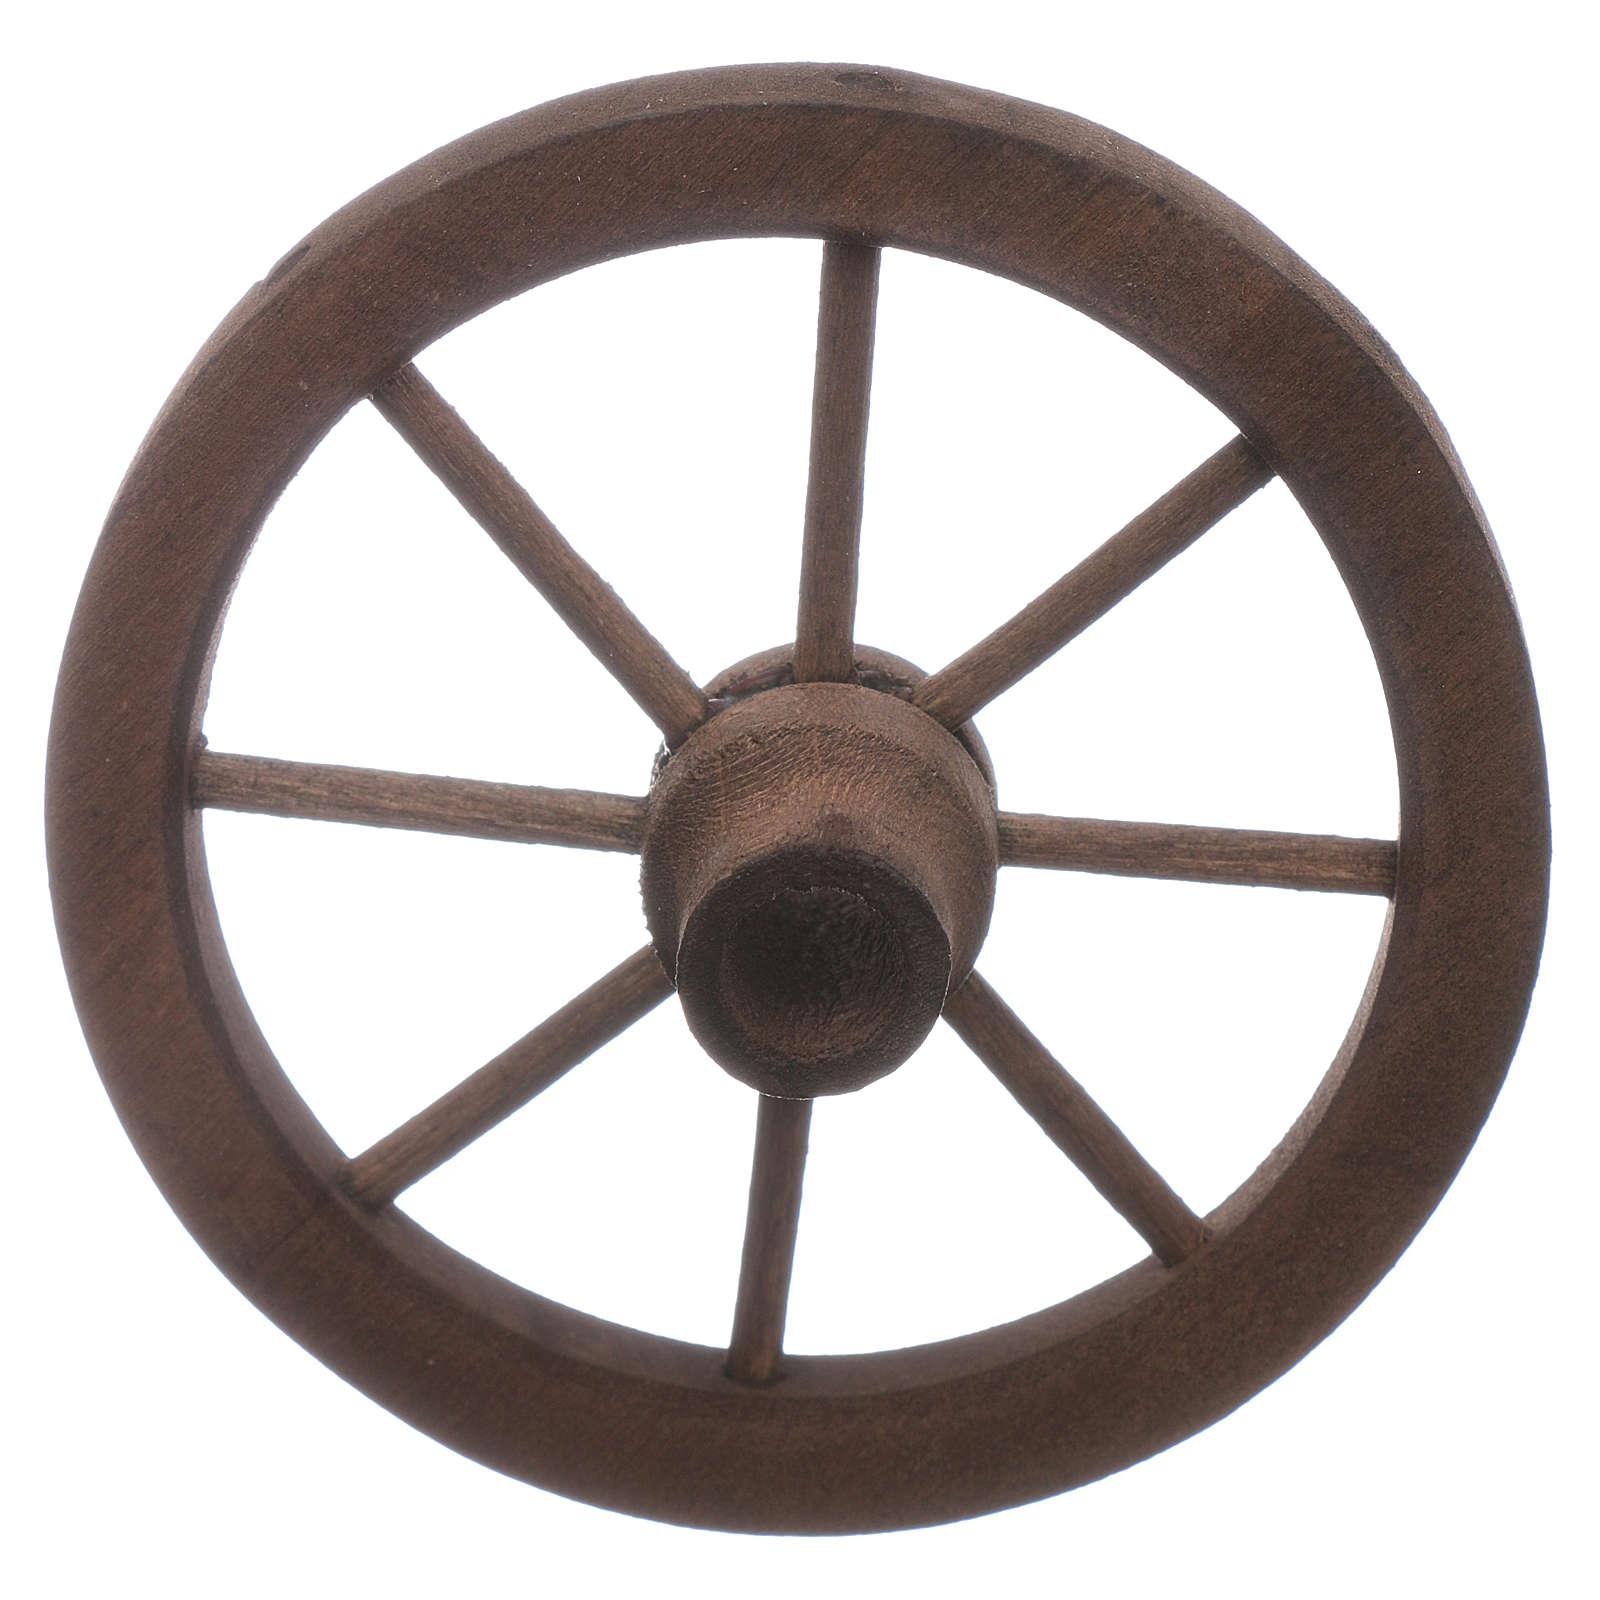 Ruota carro presepe diametro 7 cm legno 4